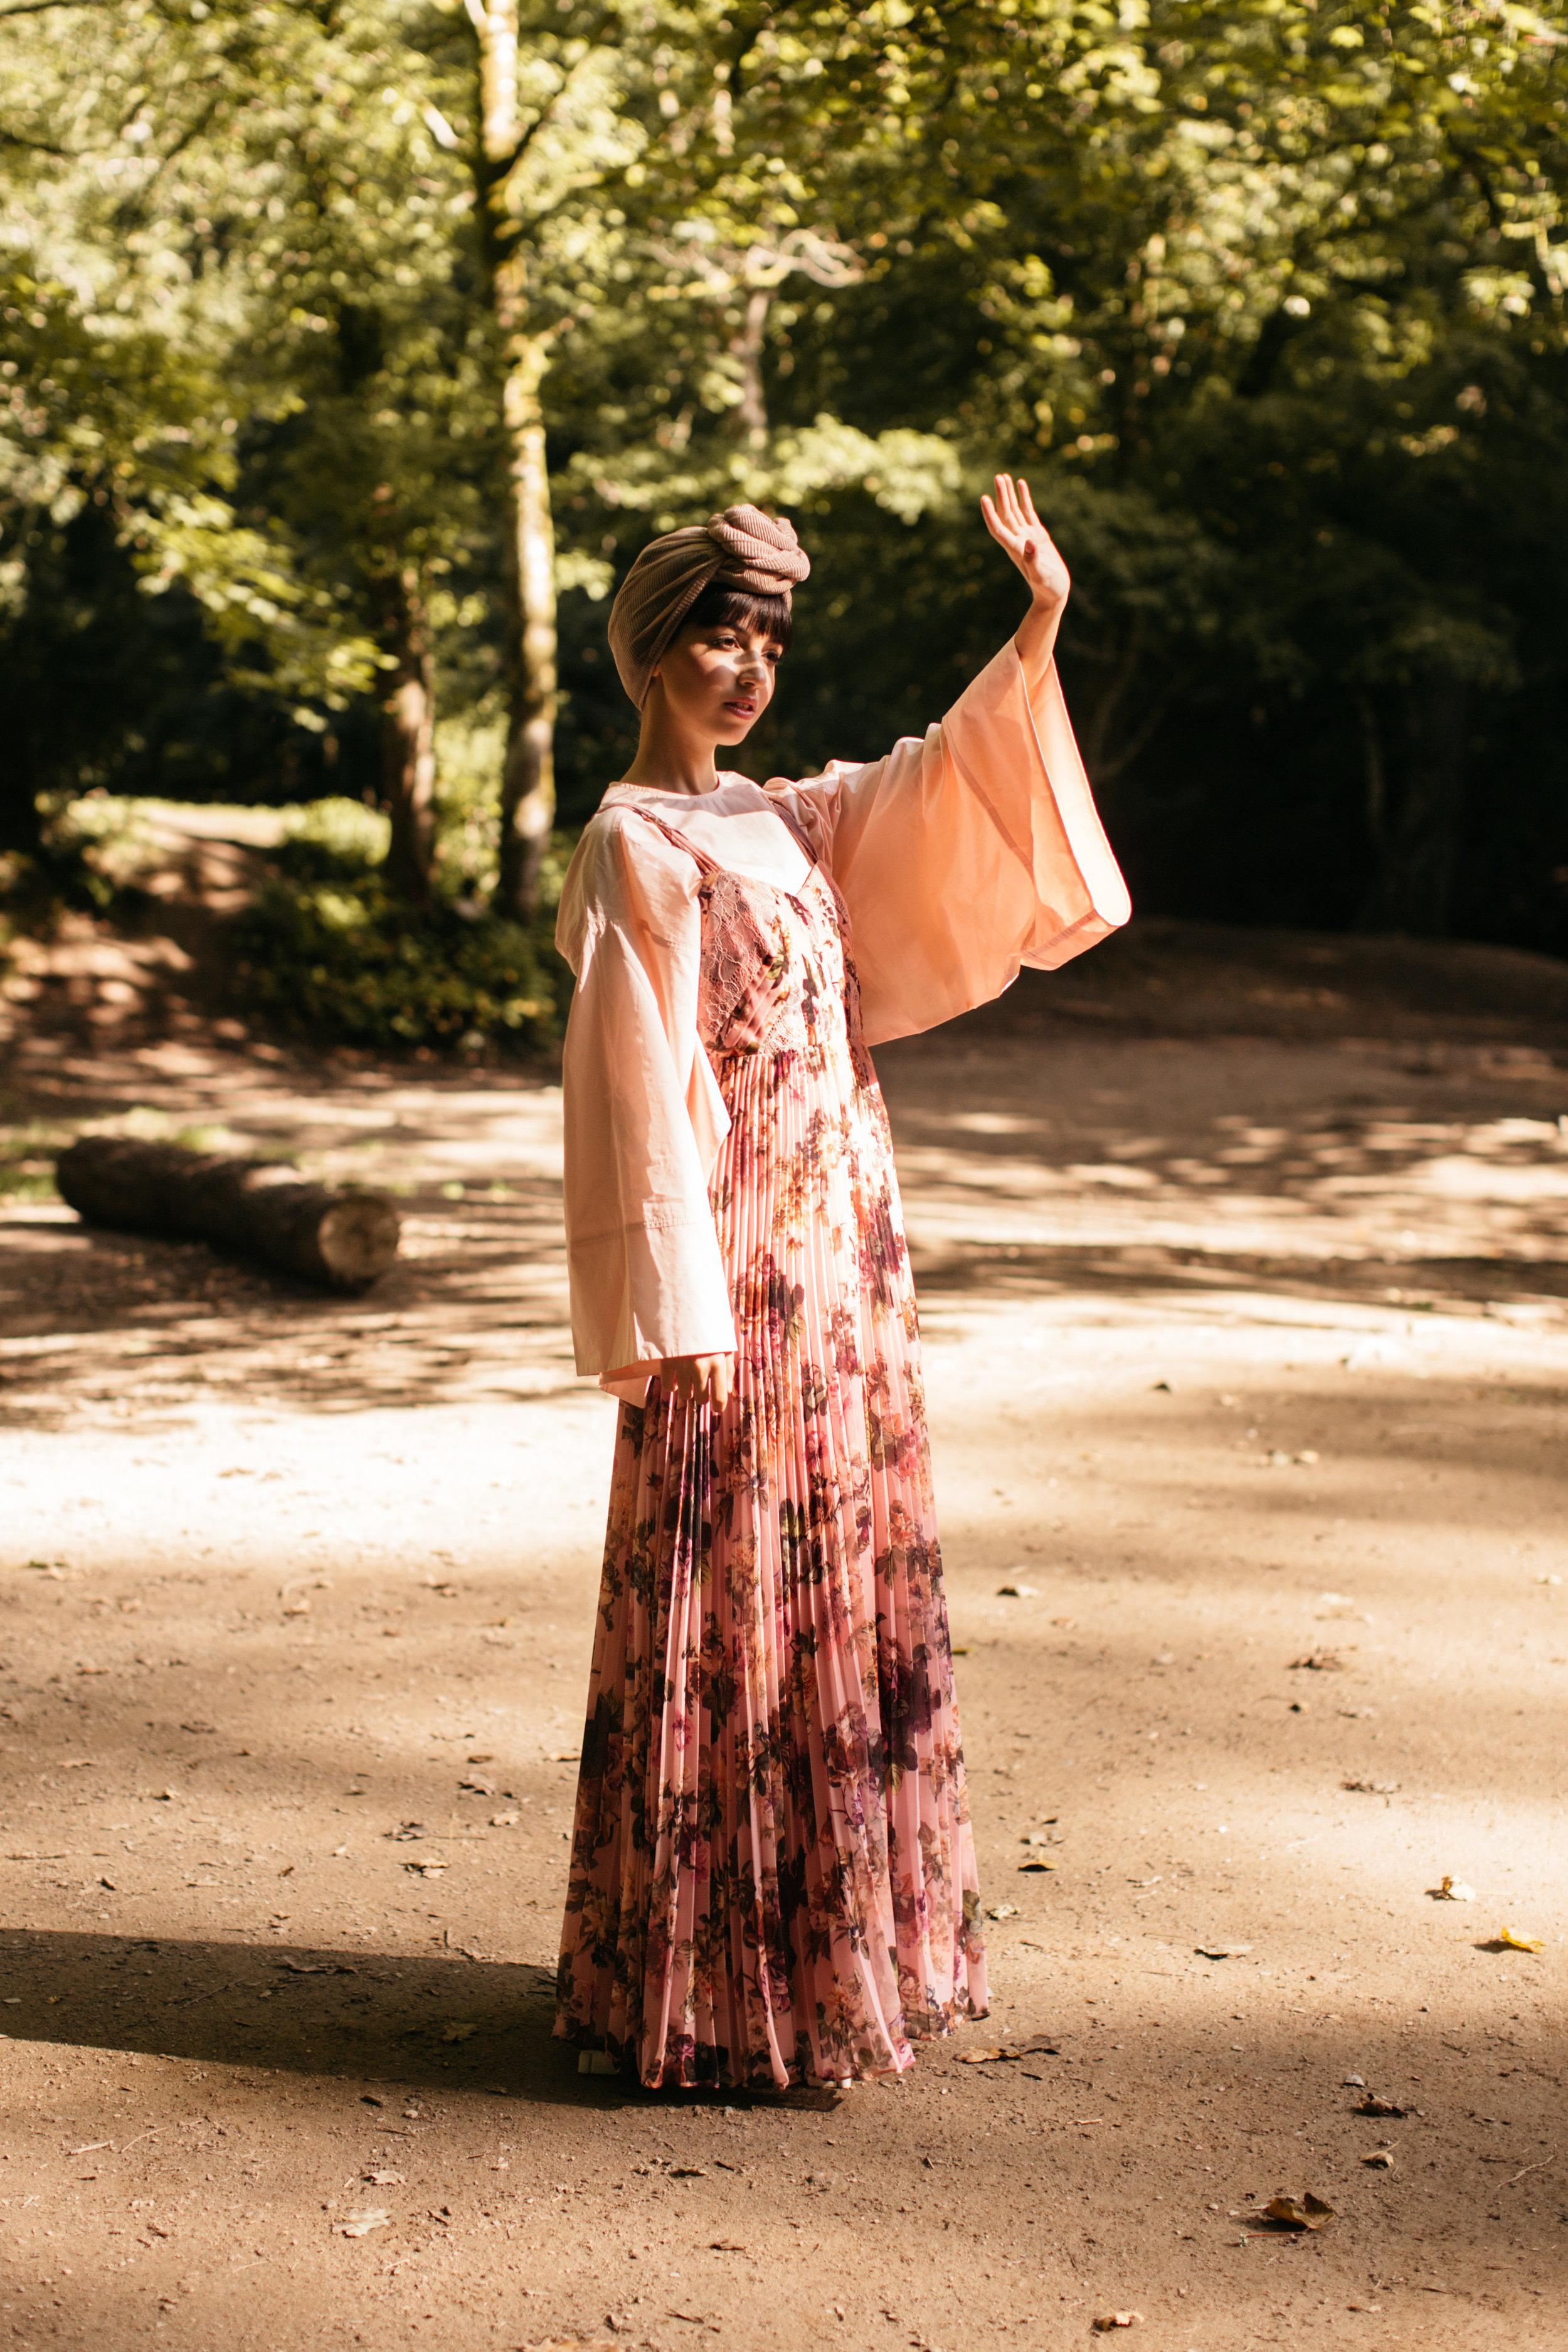 emma barrow portrait photographer studio make over plymouth